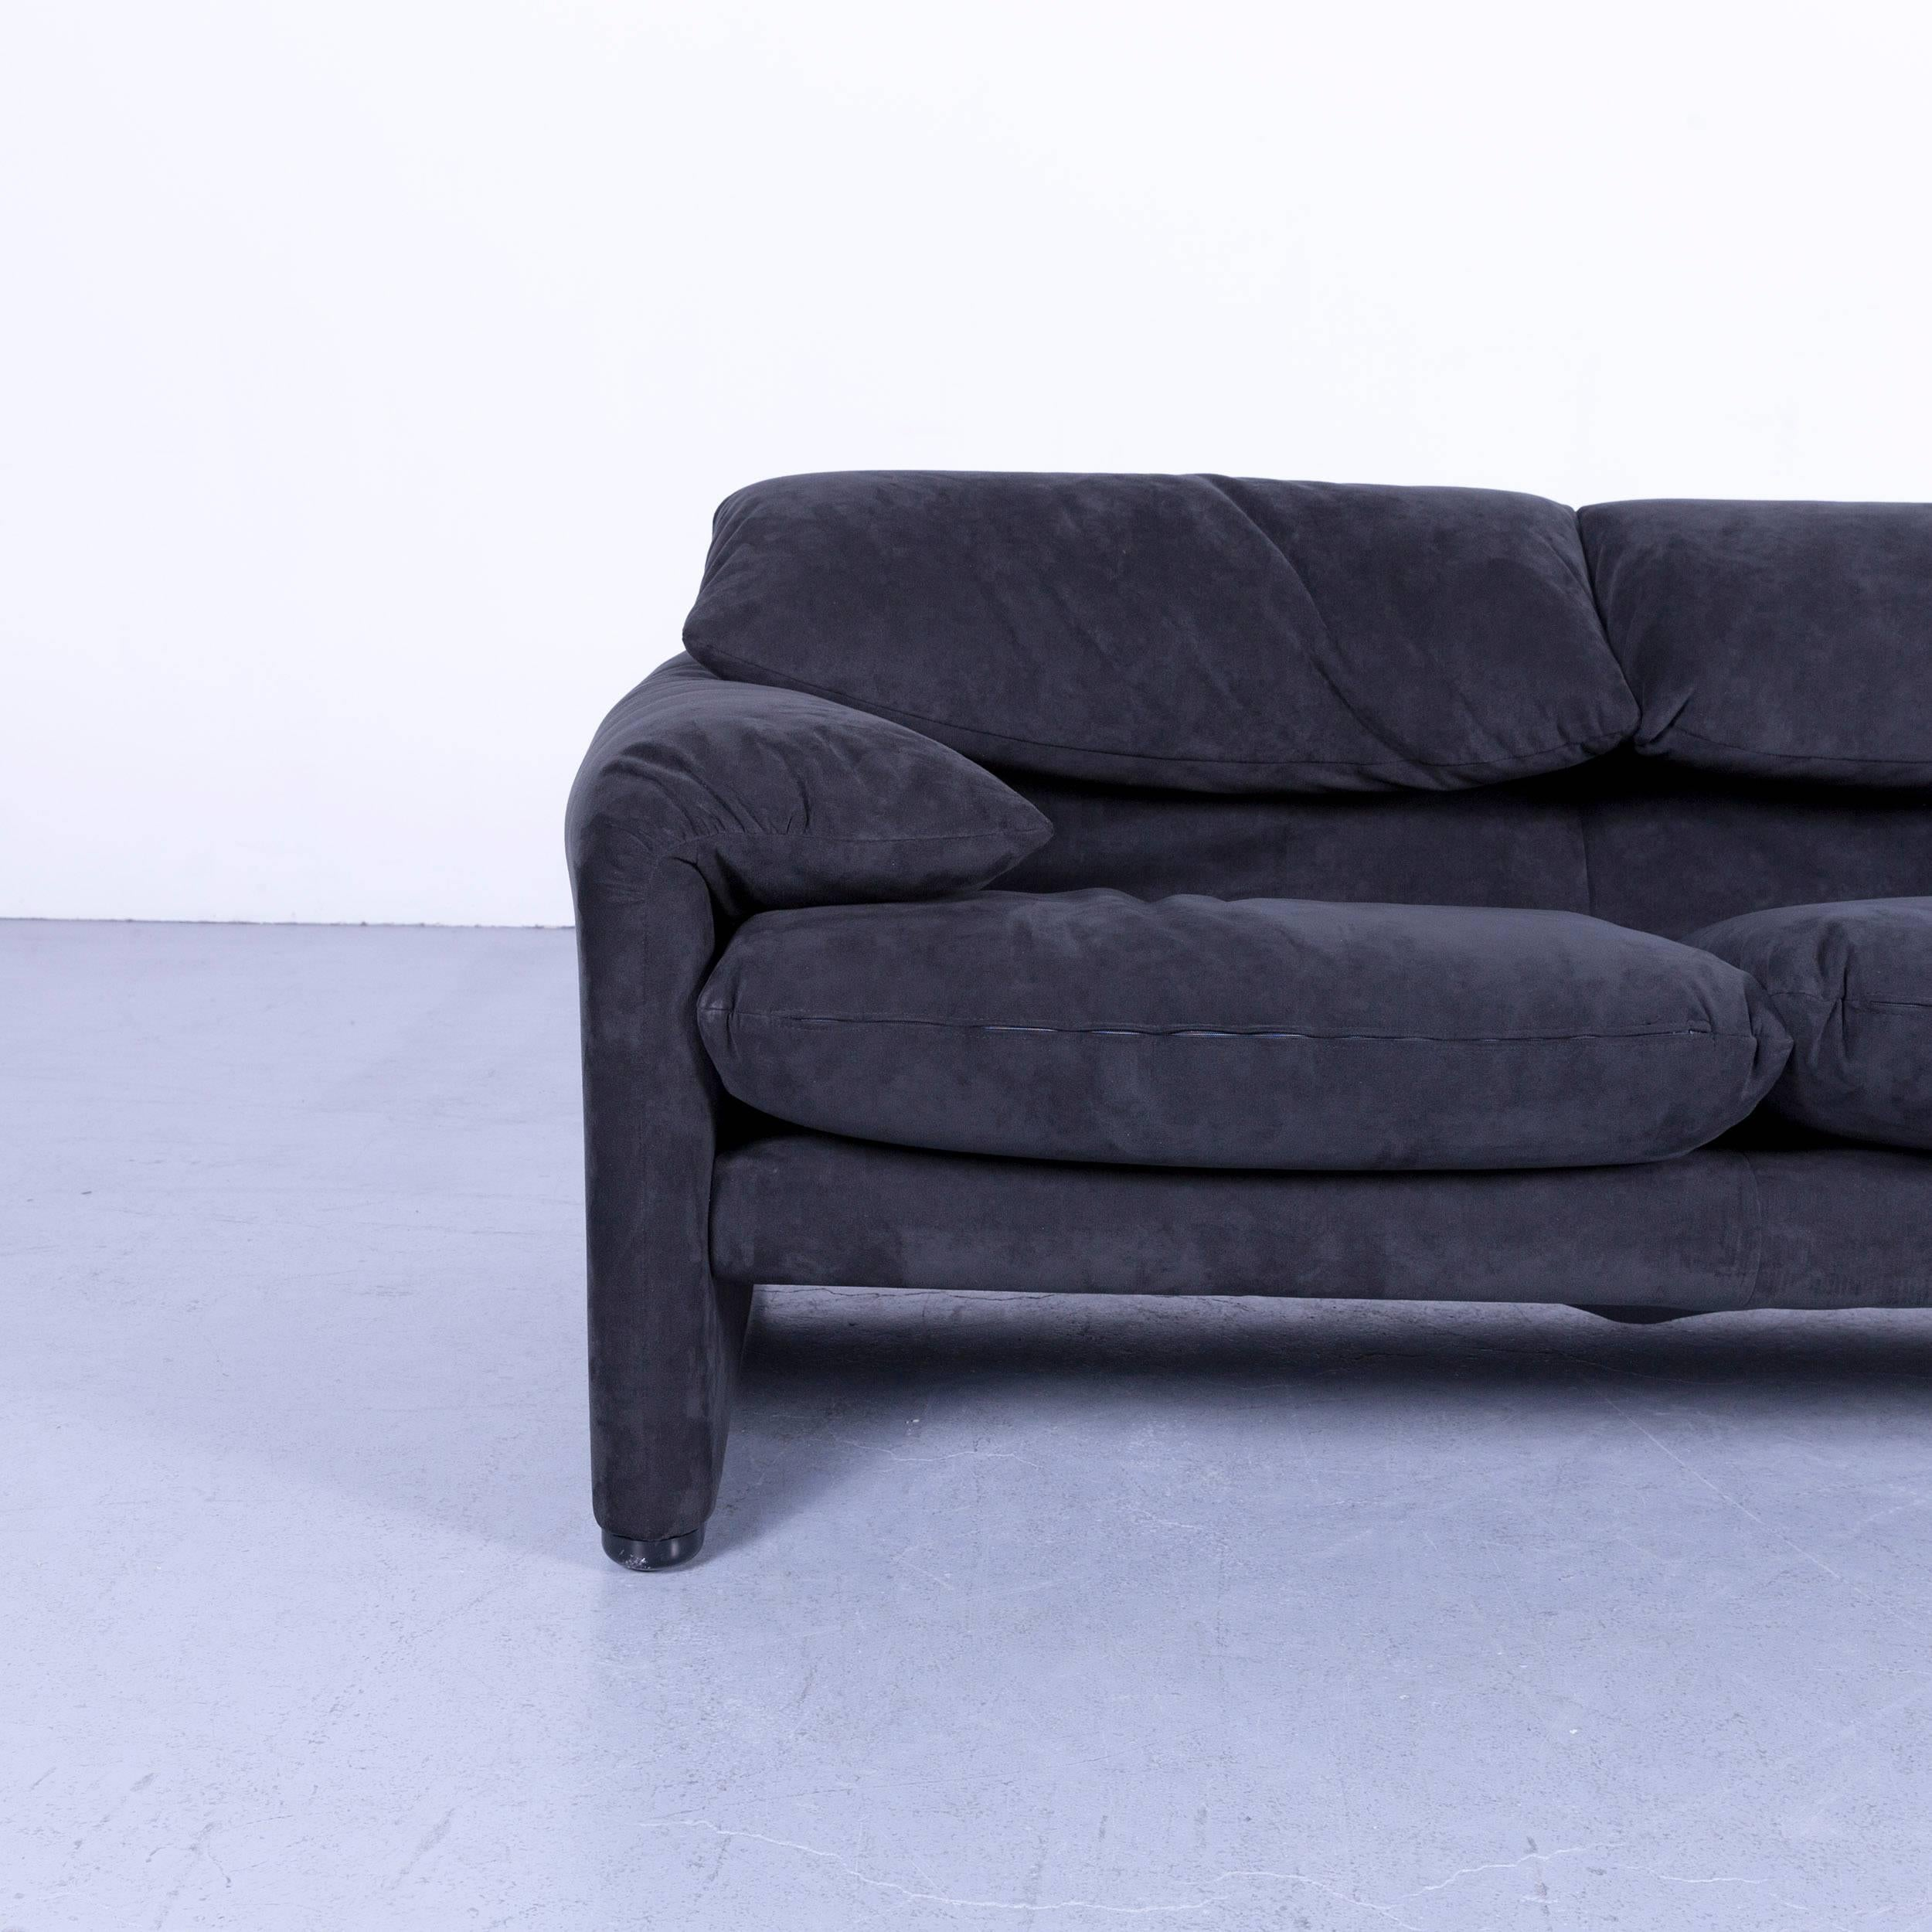 ligne roset sofa second hand cheap loveseat and alcantara kaufen affordable reinigen